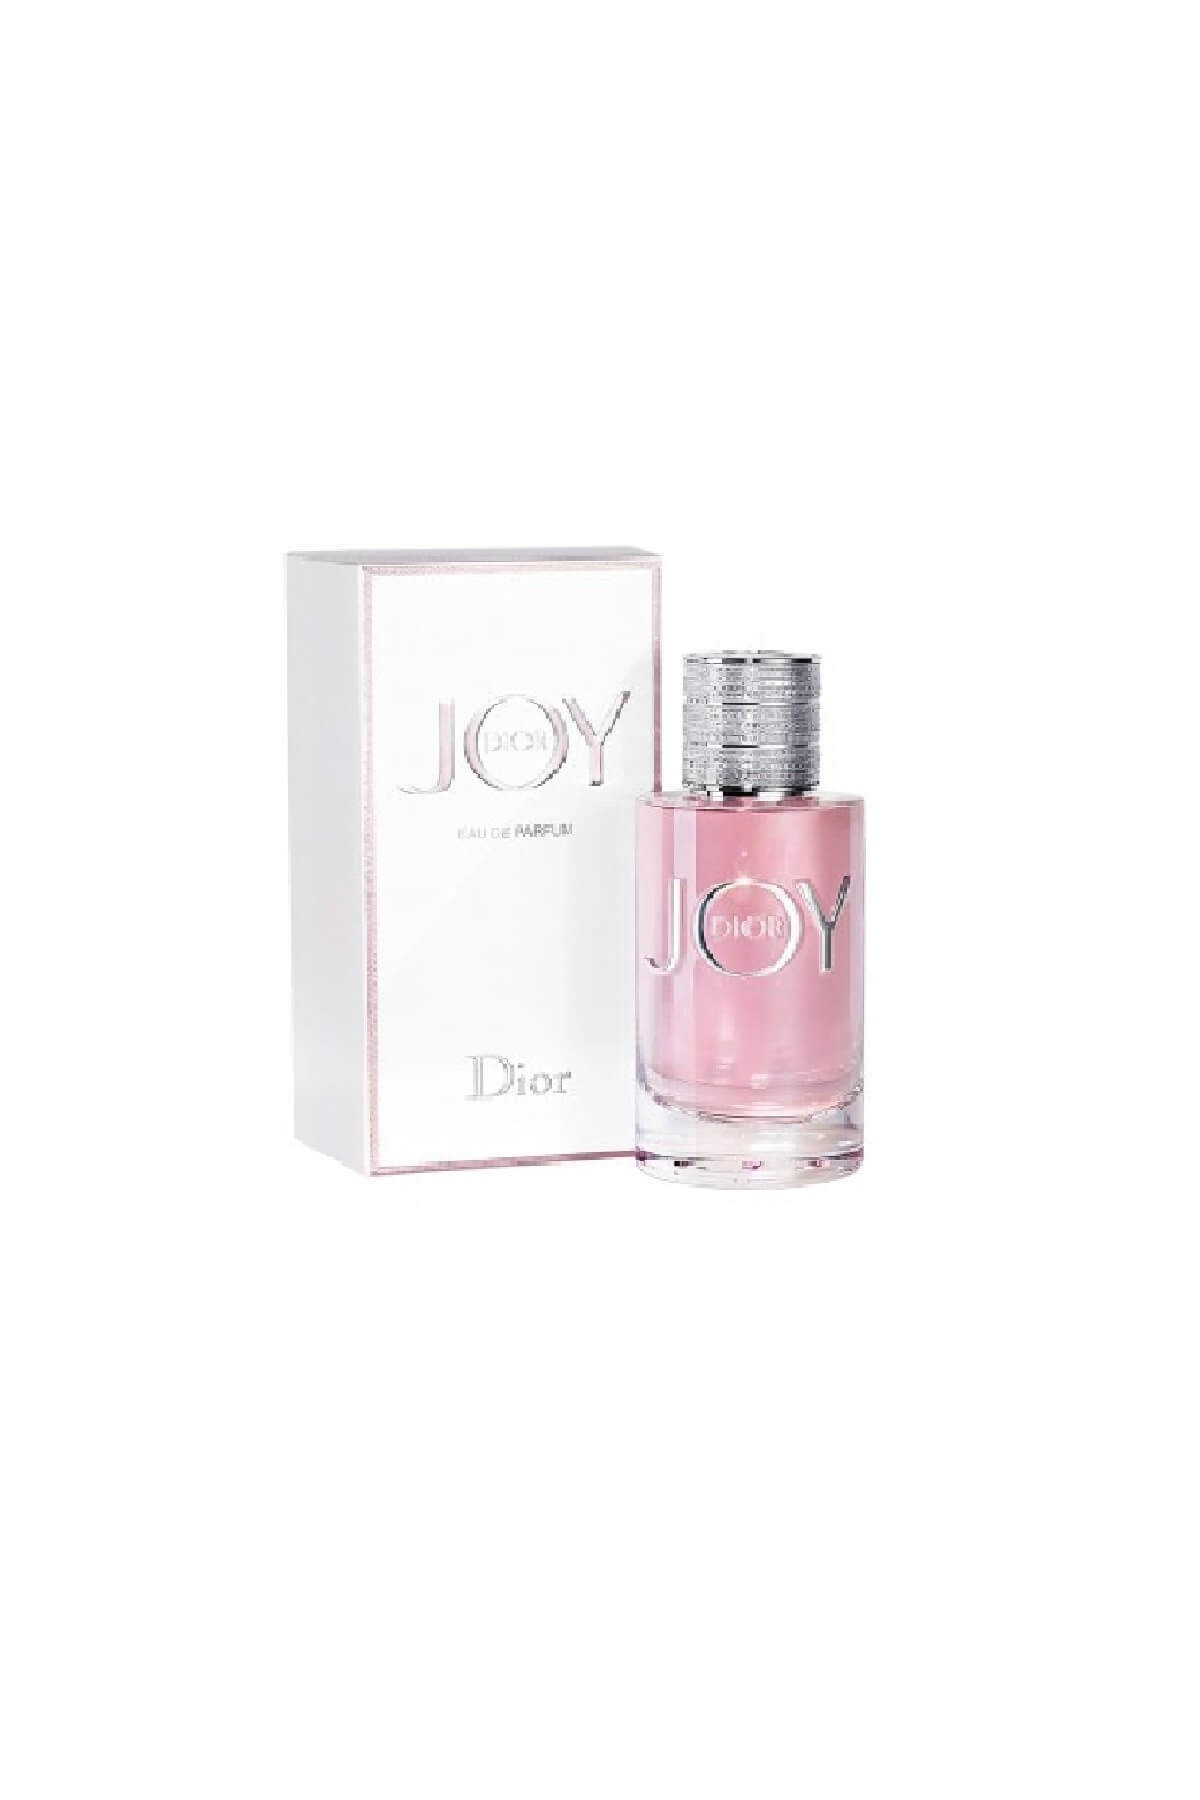 Christian Dior Joy Edp 50 ml Kadın Parfüm 3348901419086 1